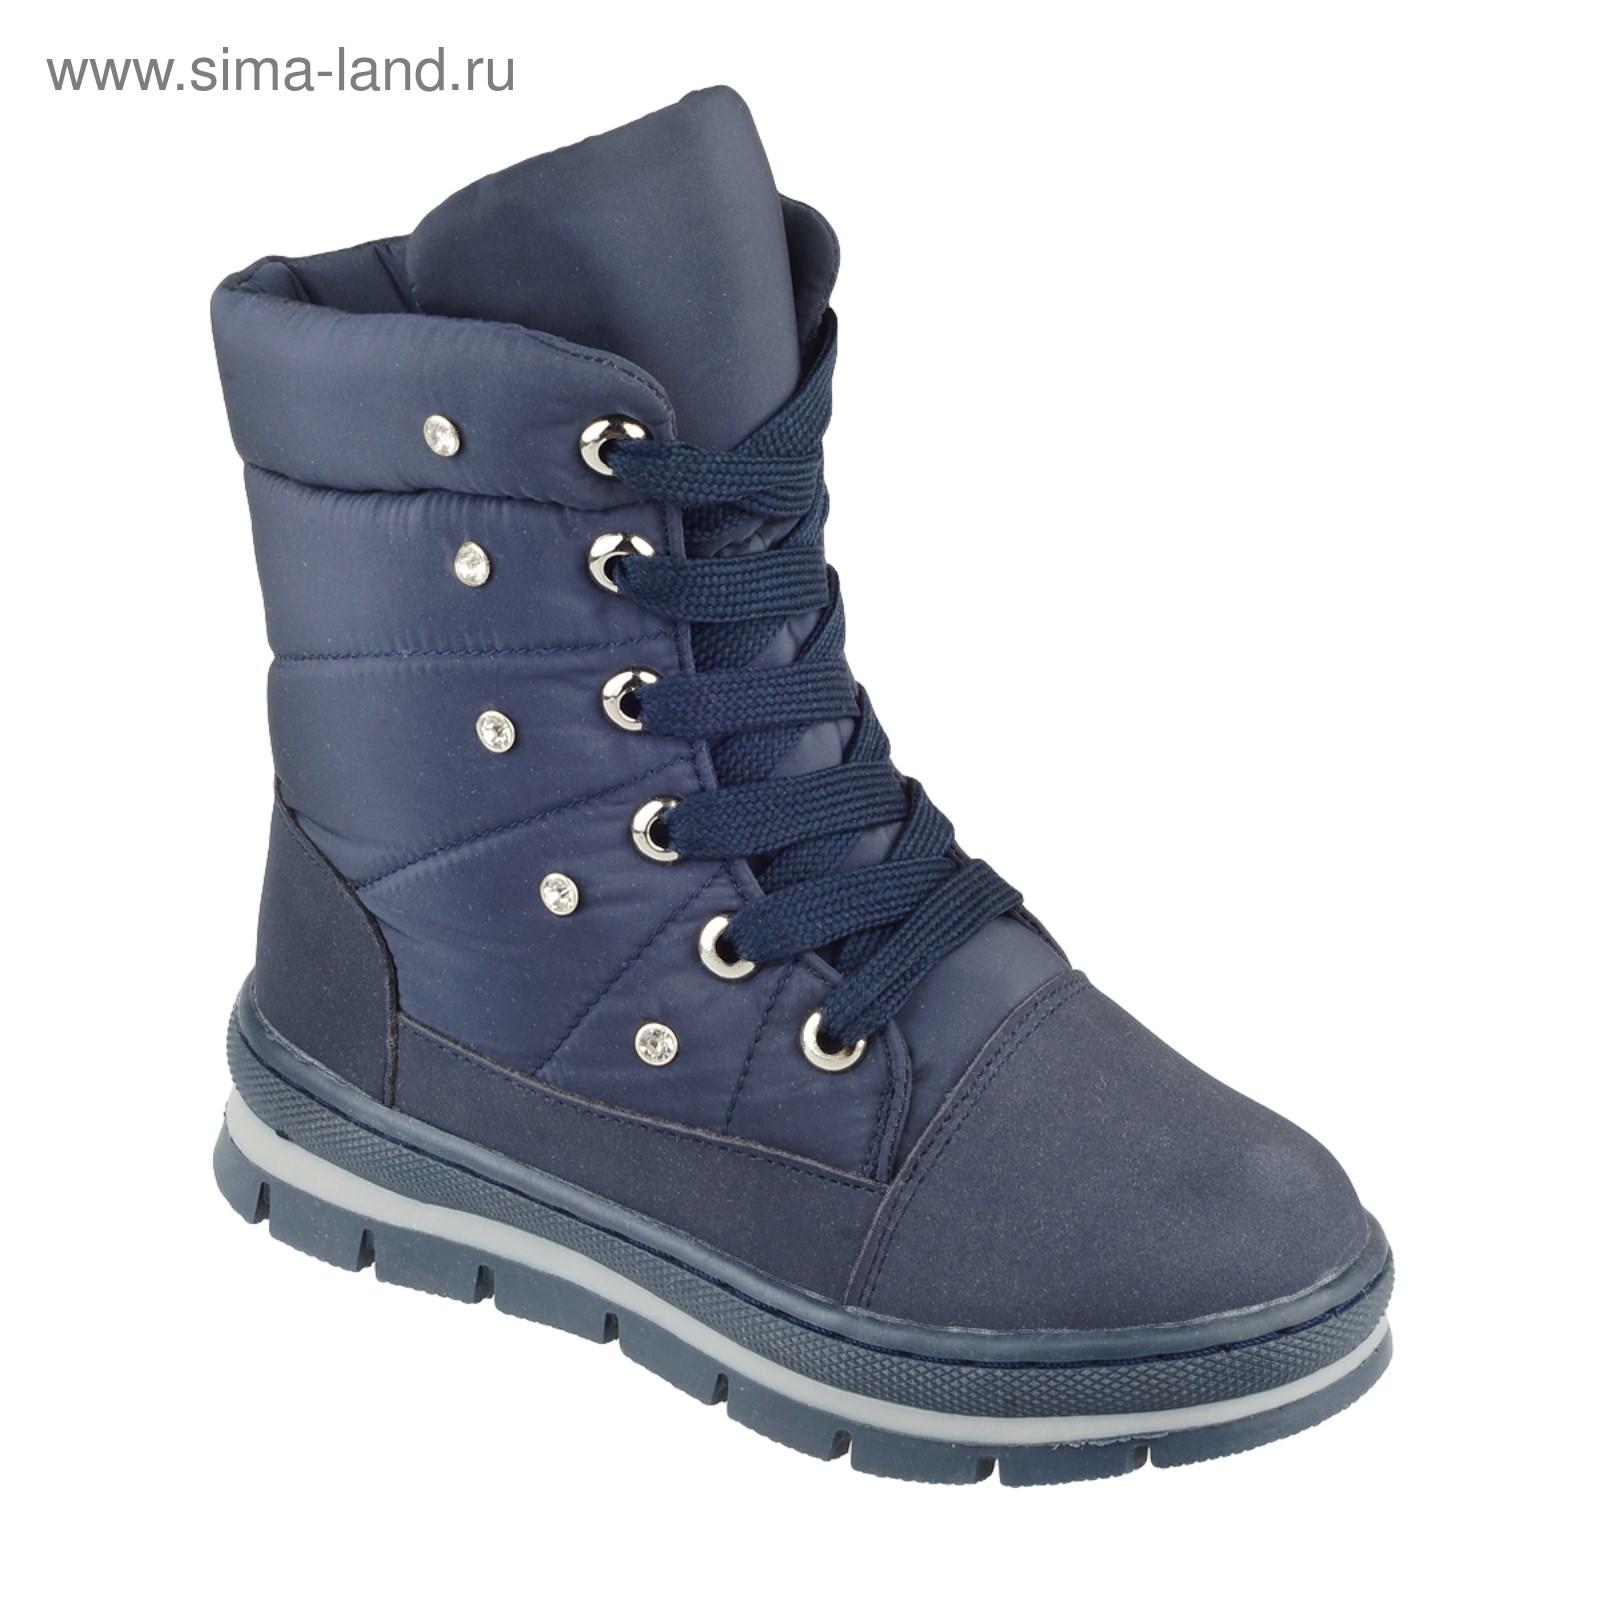 Ботинки зимние для девочки 57d35137695bc